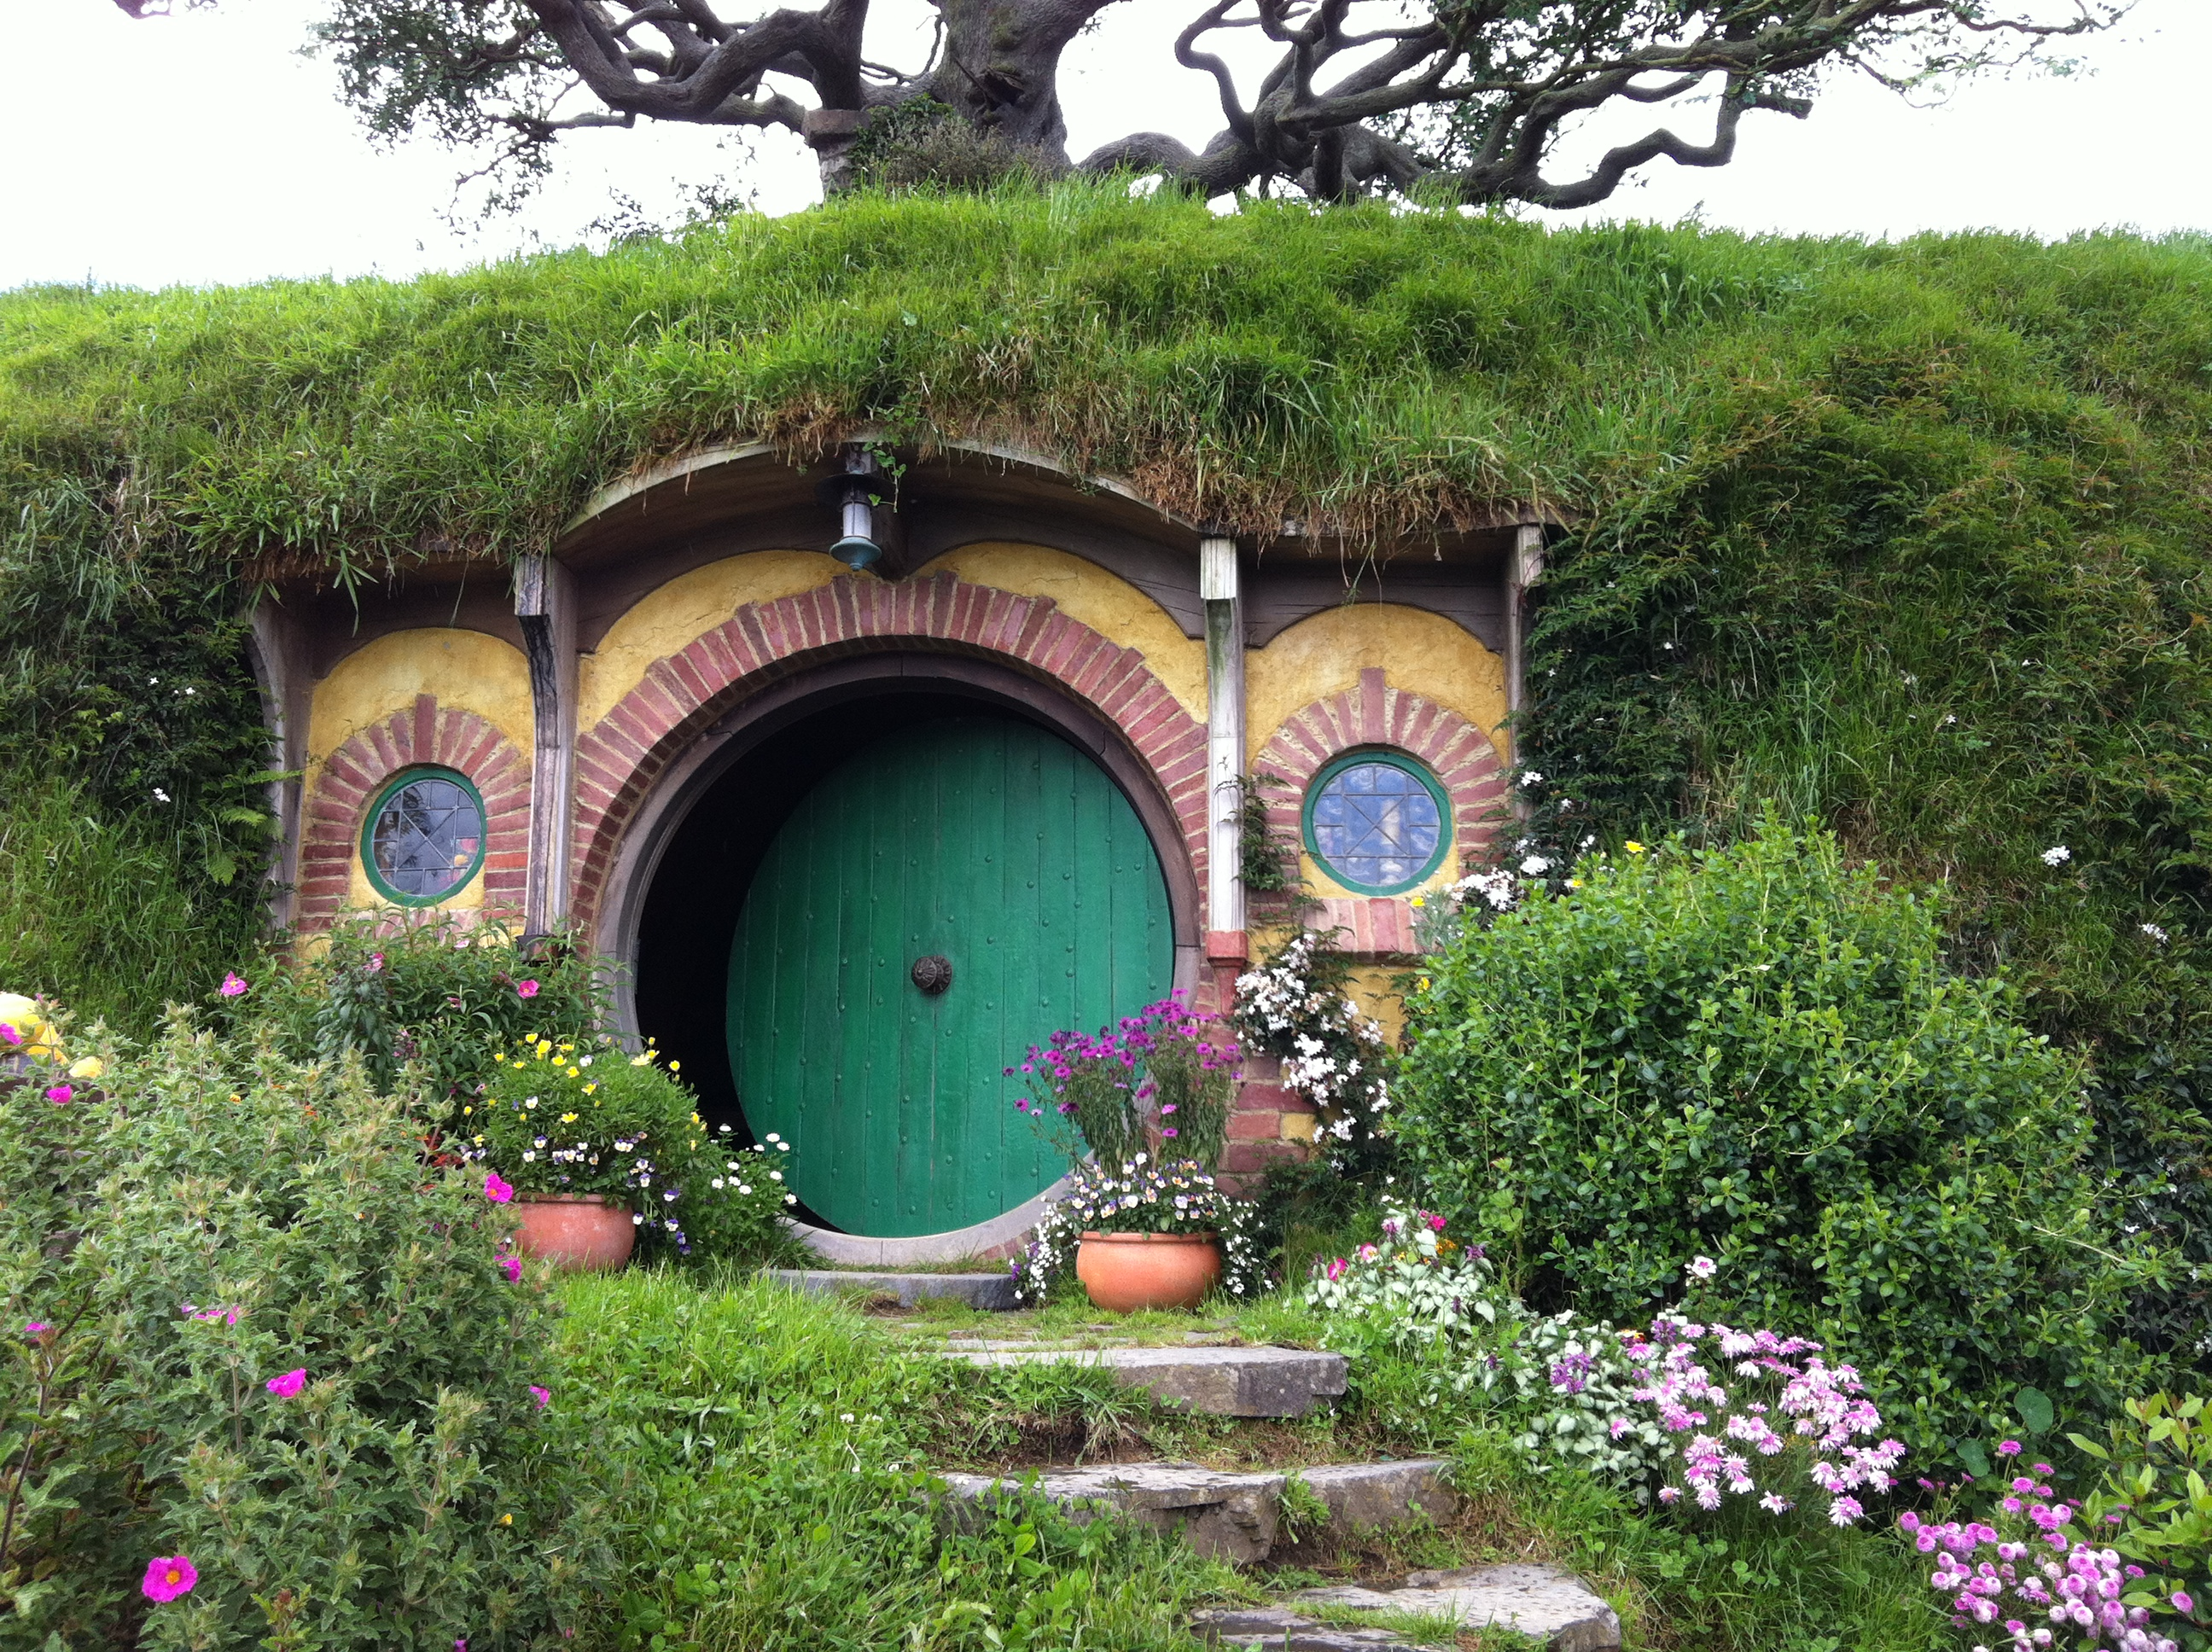 File:Hobbiton, The Shires, Middle-Earth, Matamata, New Zealand - panoramio (7).jpg - Wikimedia Commons